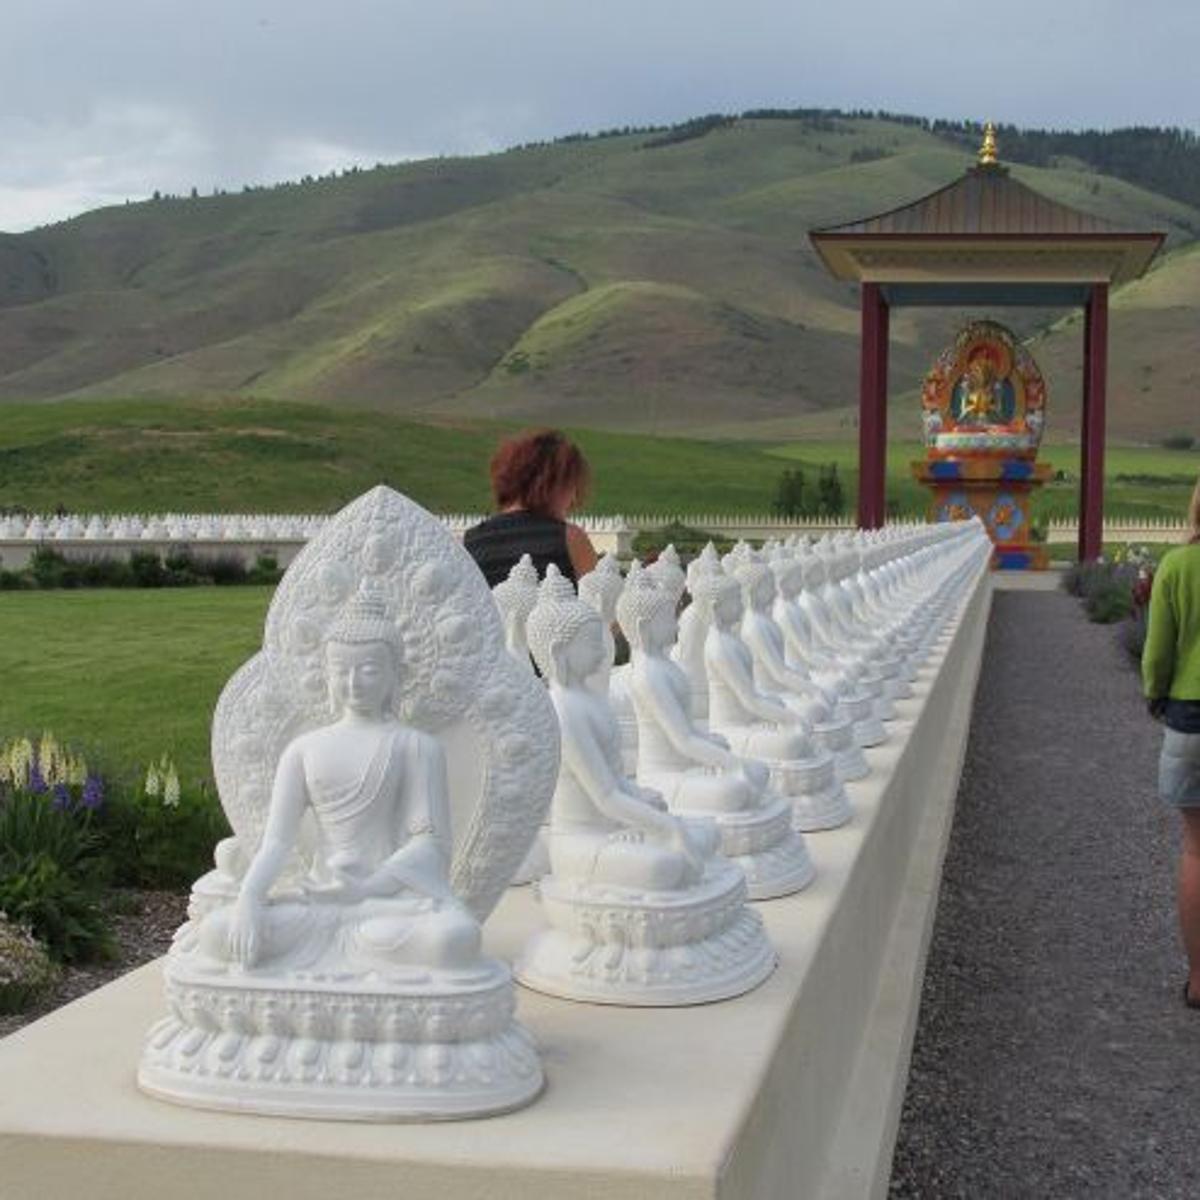 Hitting The Road Garden Of One Thousand Buddhas Enjoy Billings Billingsgazette Com